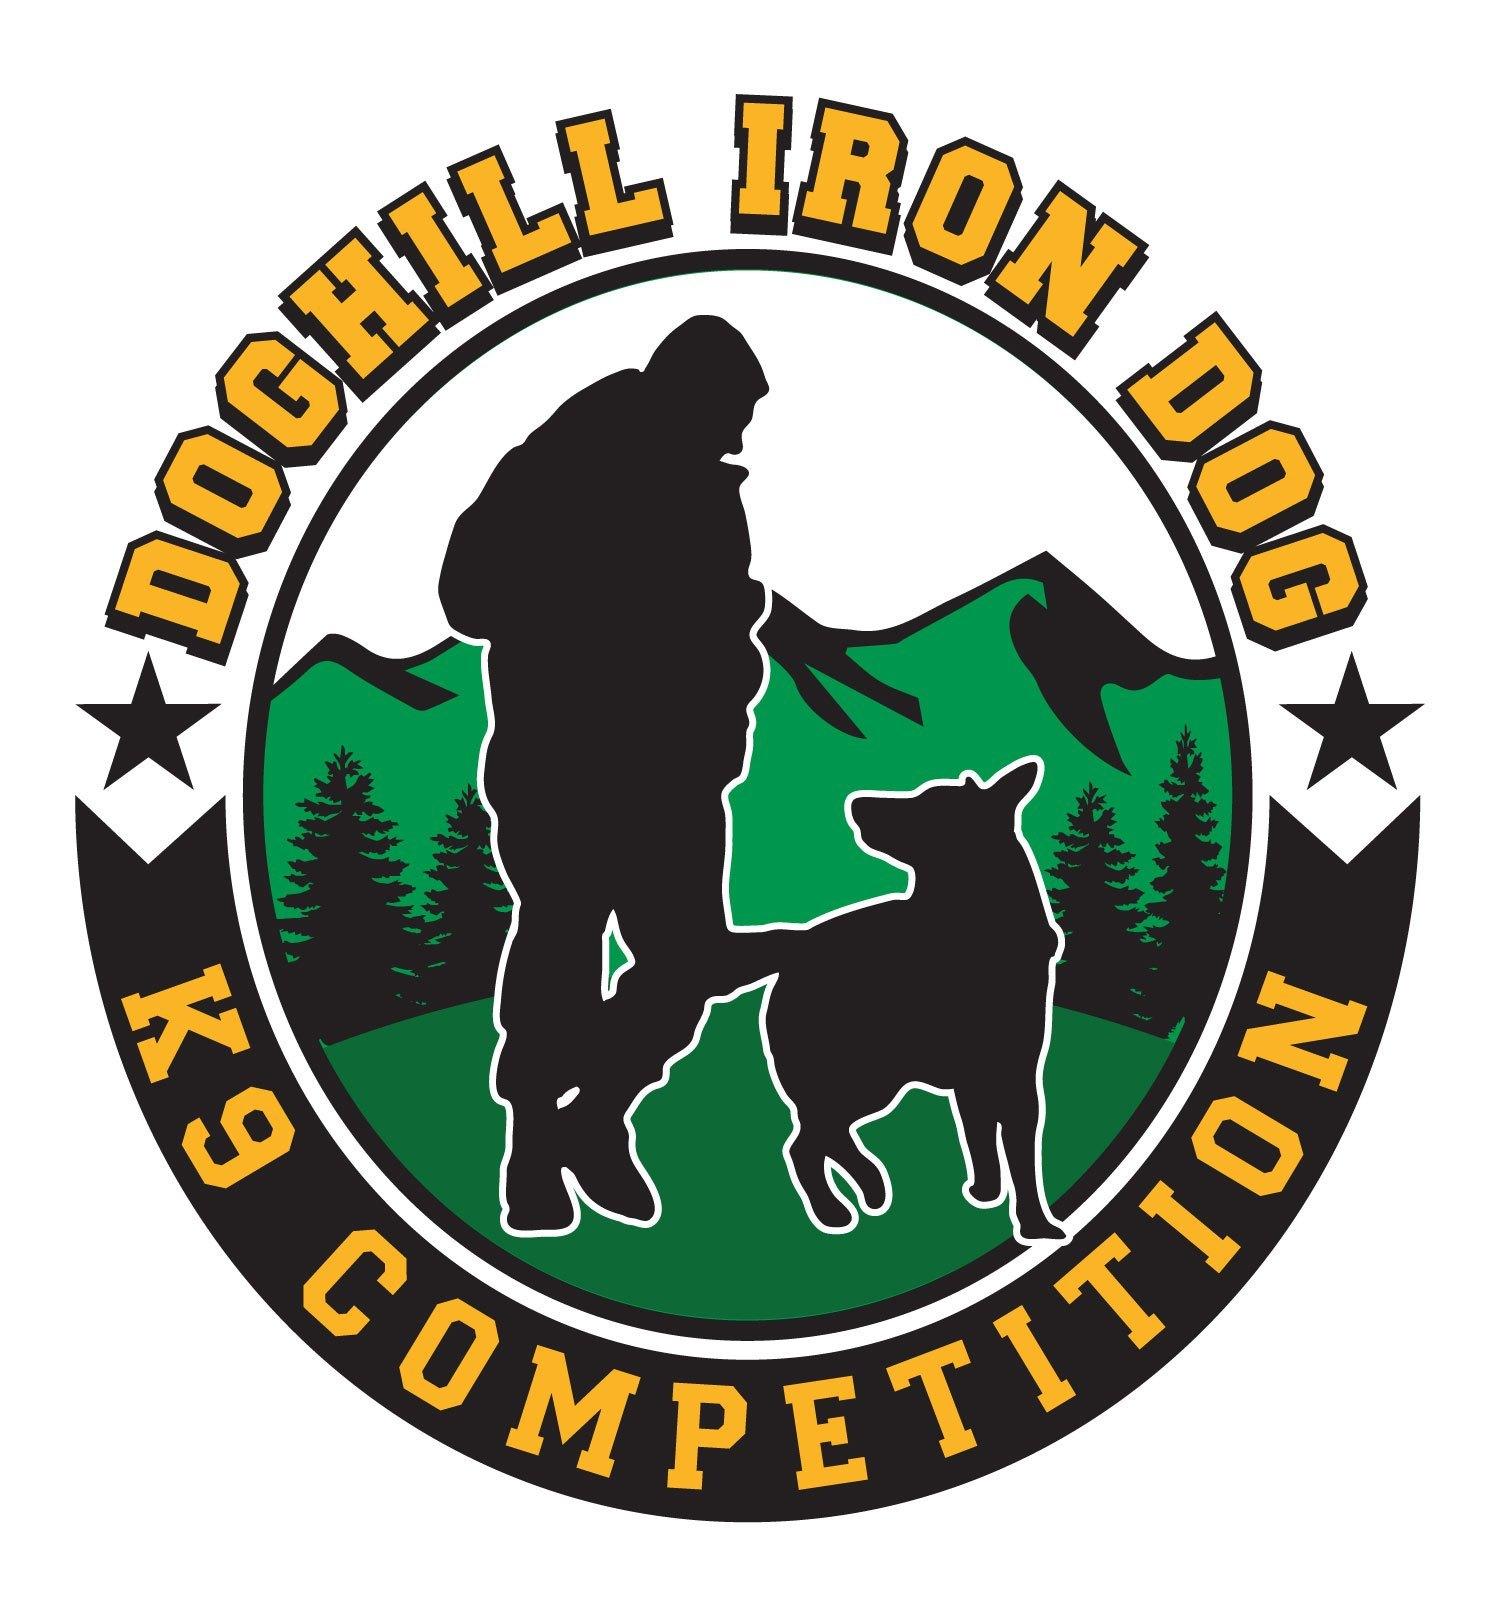 DogHill K9 Iron Dog